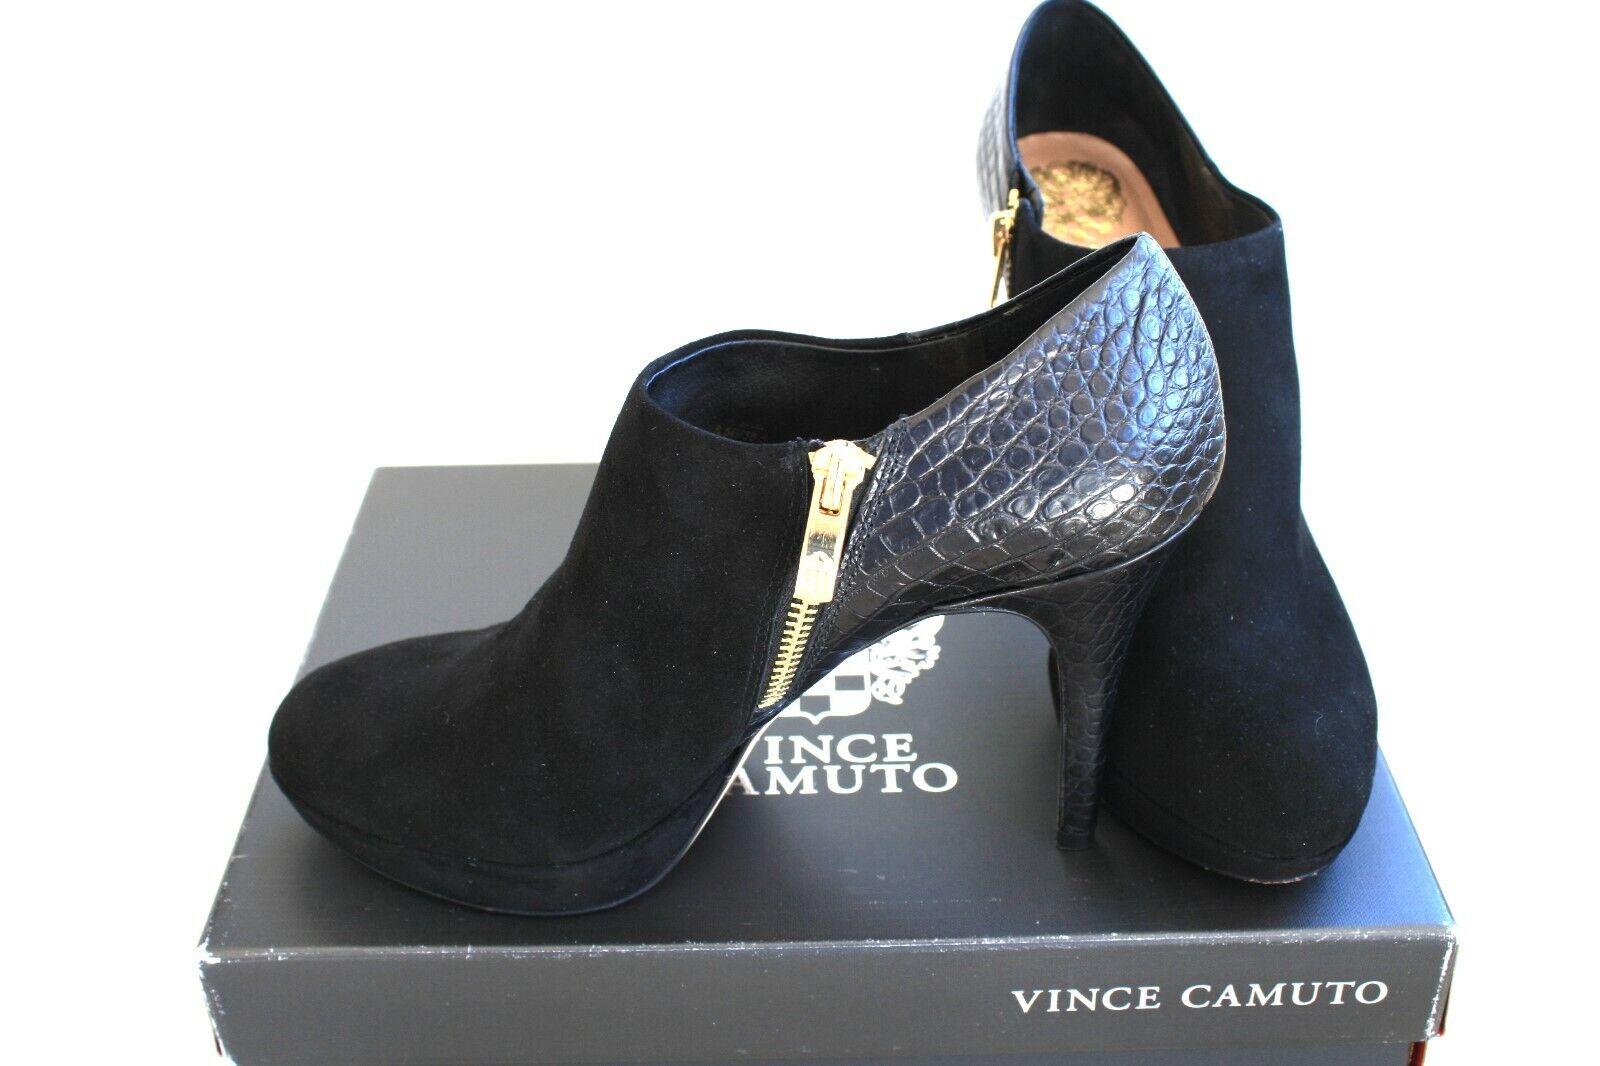 NIB Vince Camuto BLACK Leather Glossy Crock Stiletto Heel Ladies shoes 8.5 M